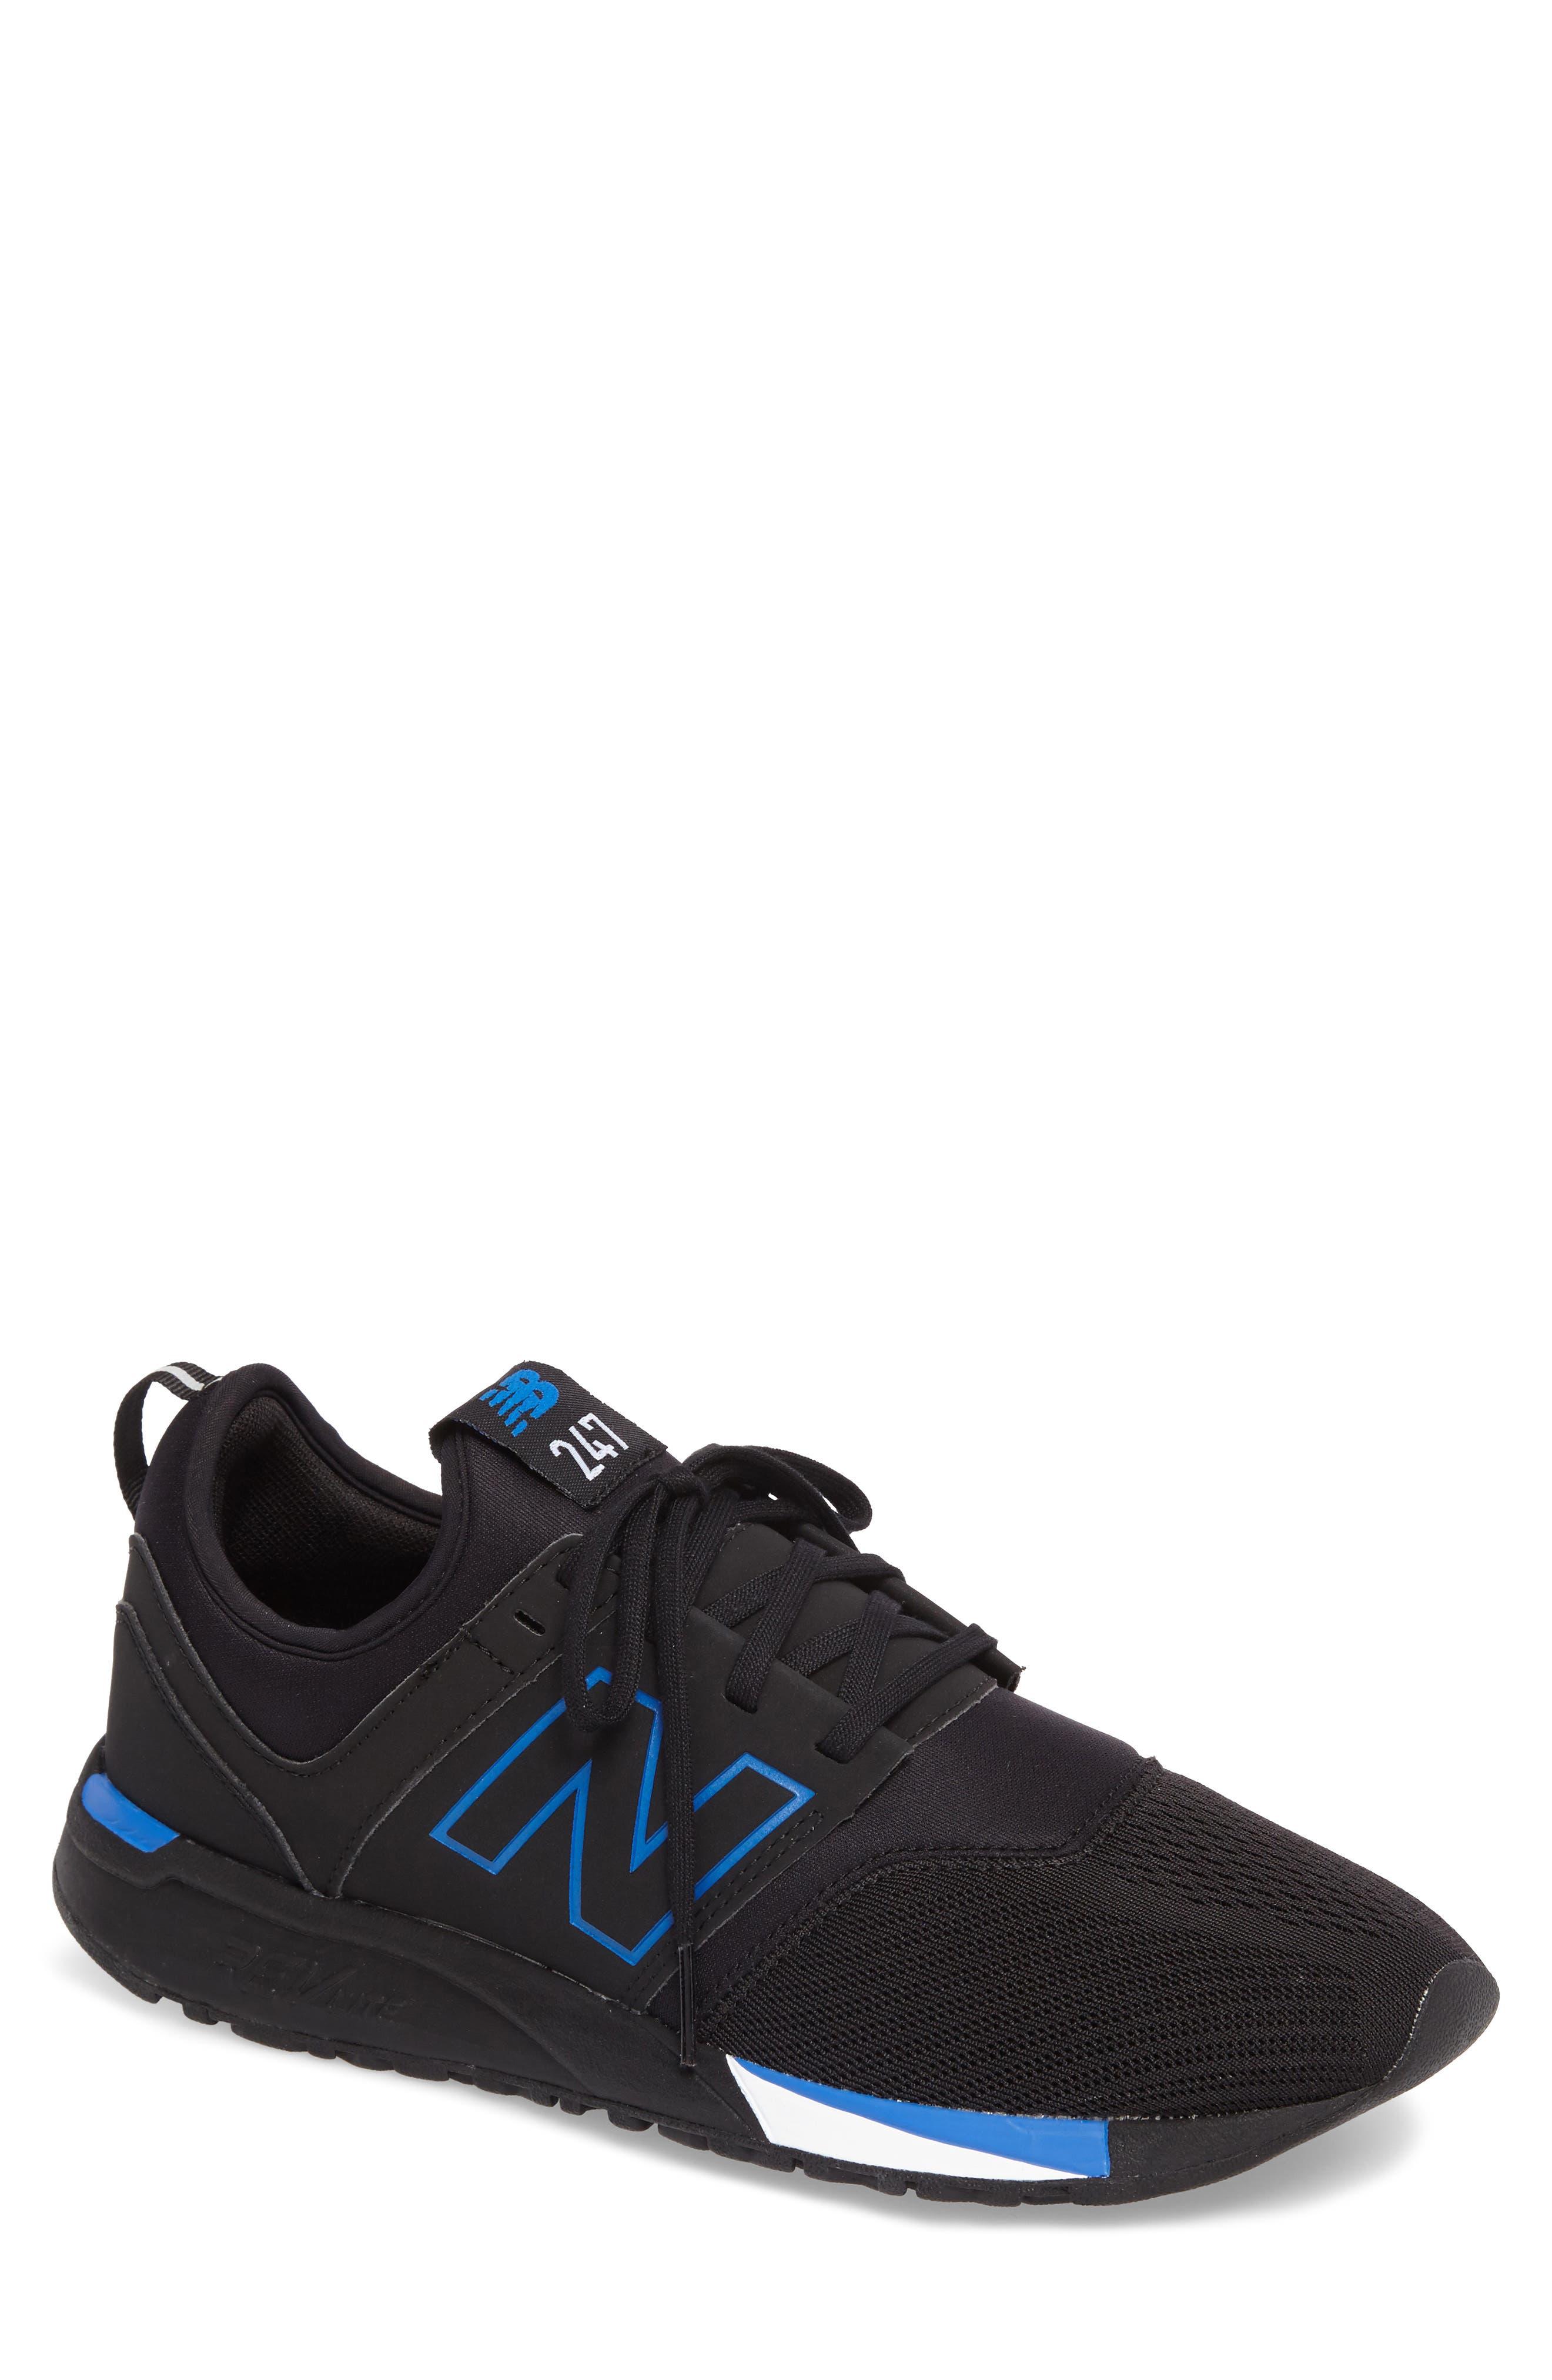 New Balance 247 Sneaker (Men)